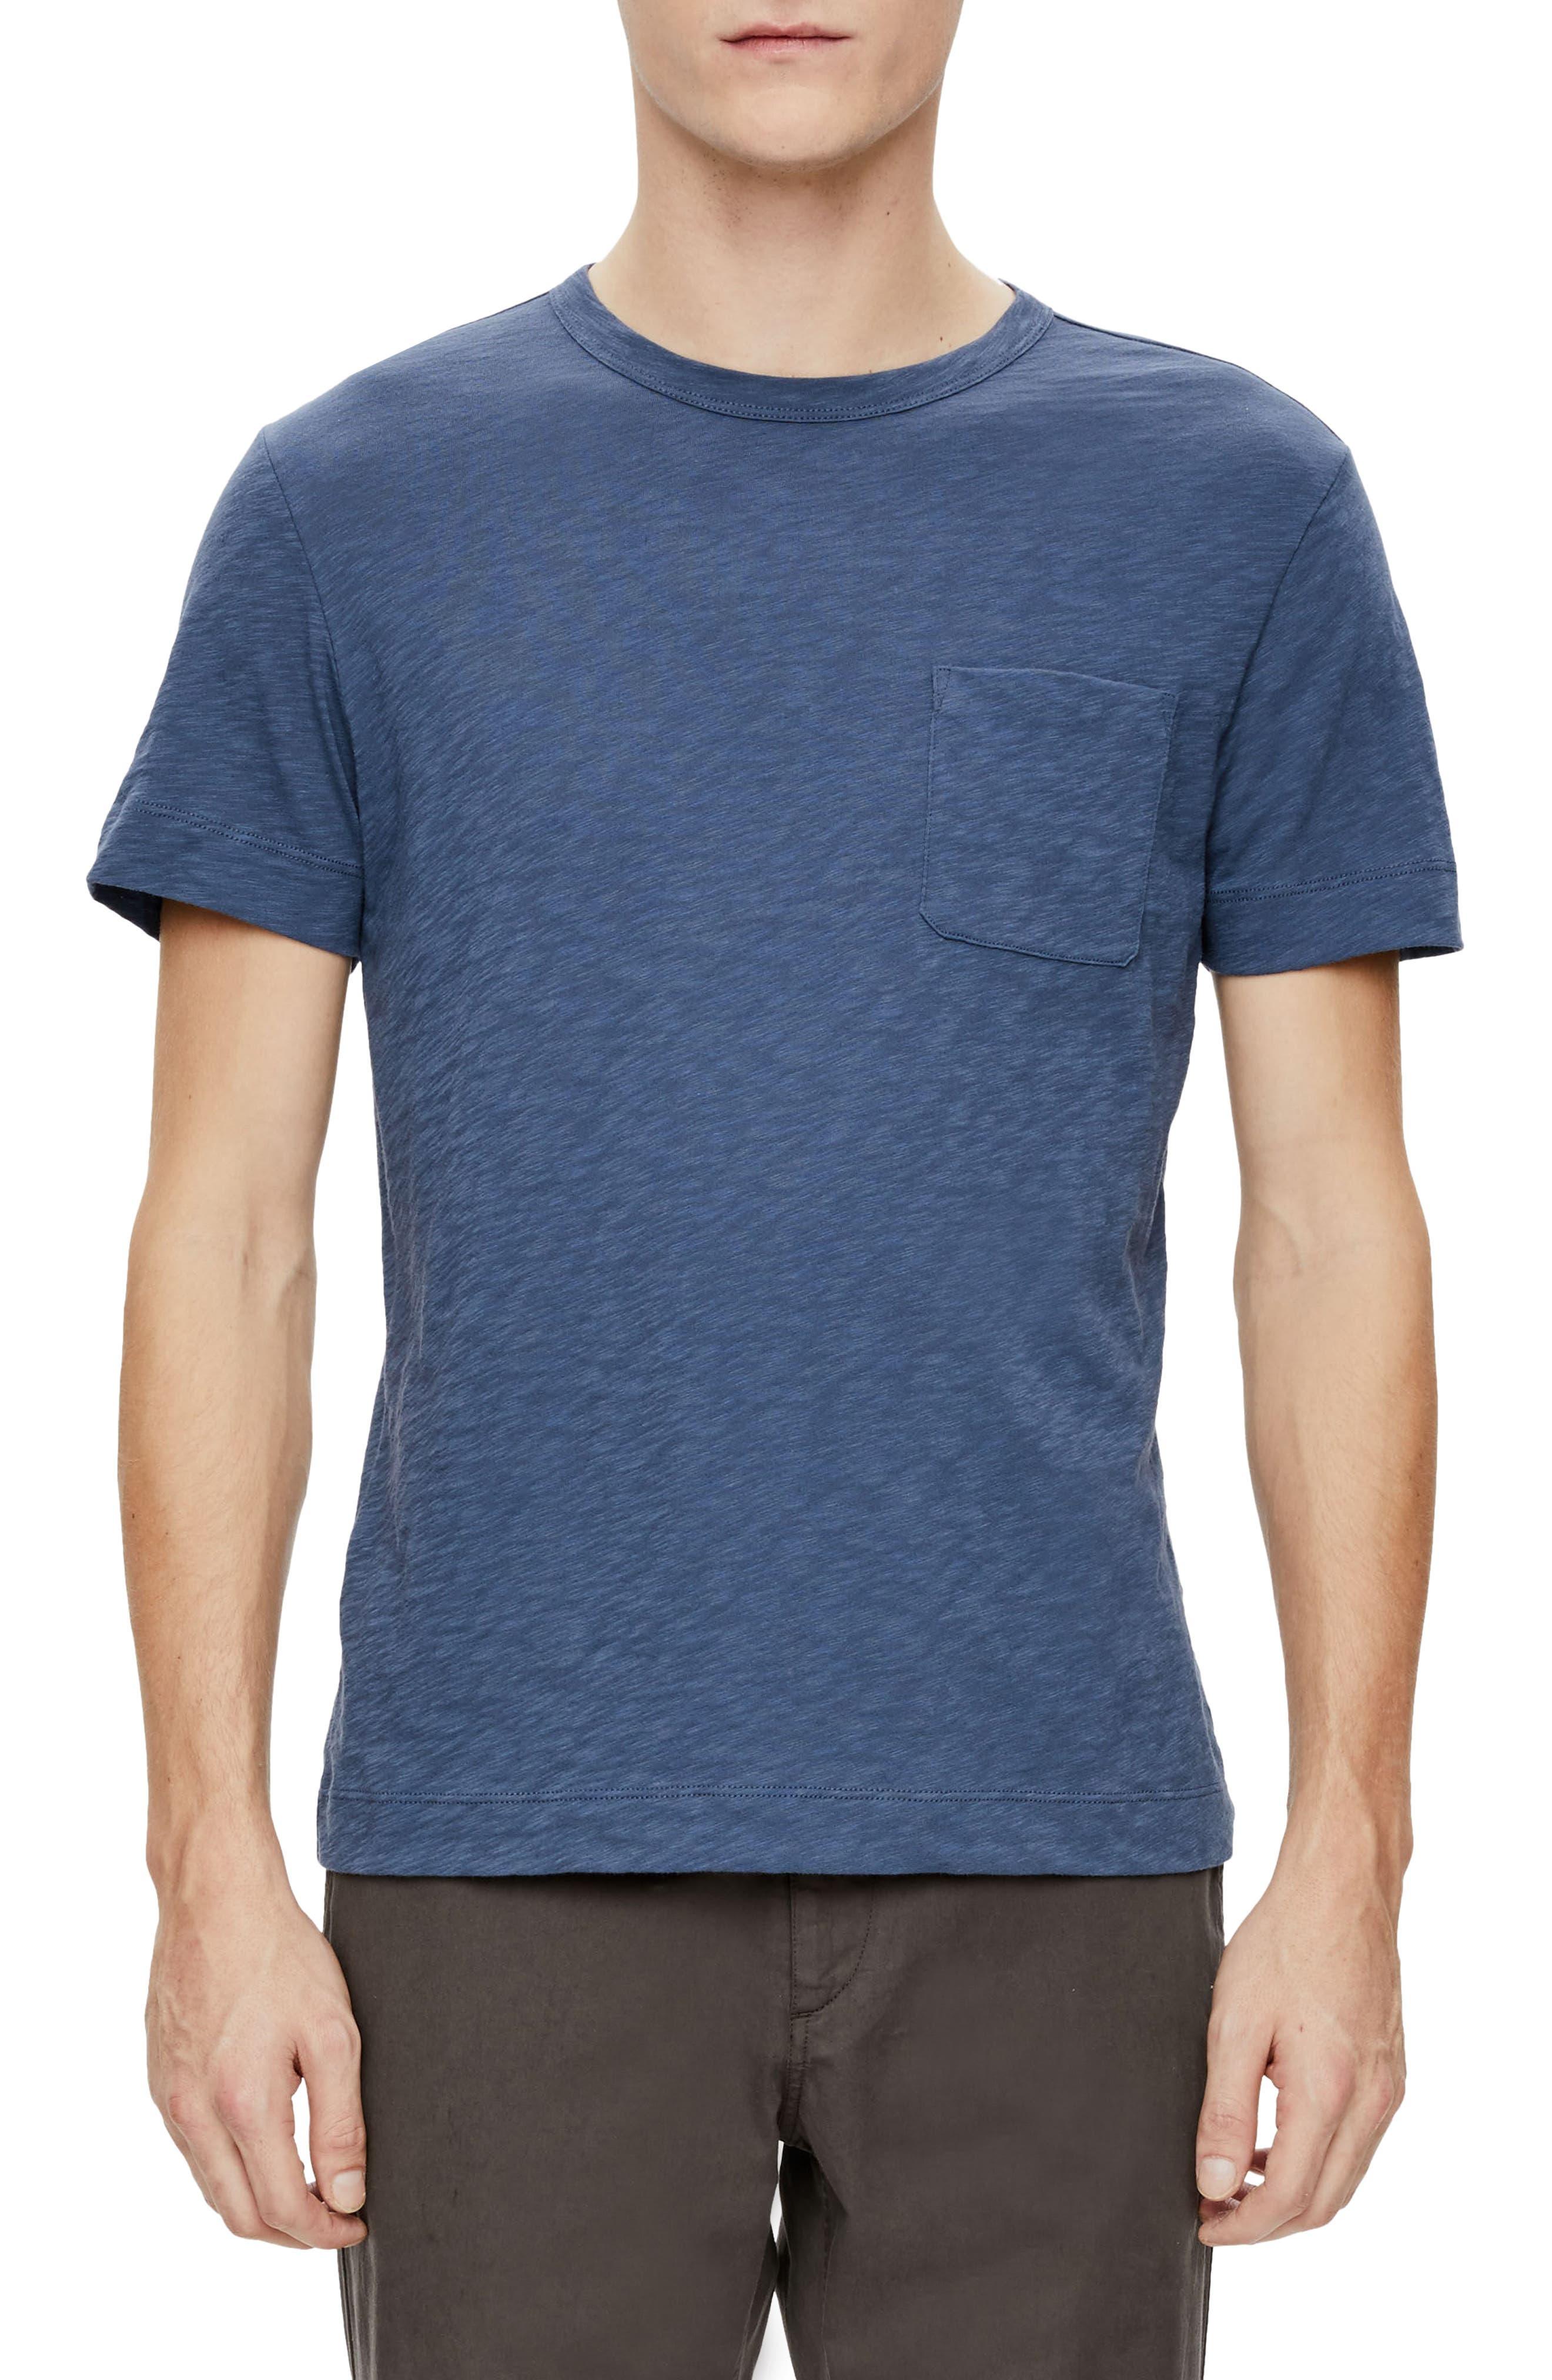 Alternate Image 1 Selected - Theory Gaskell Nebulous Slub Pocket T-Shirt